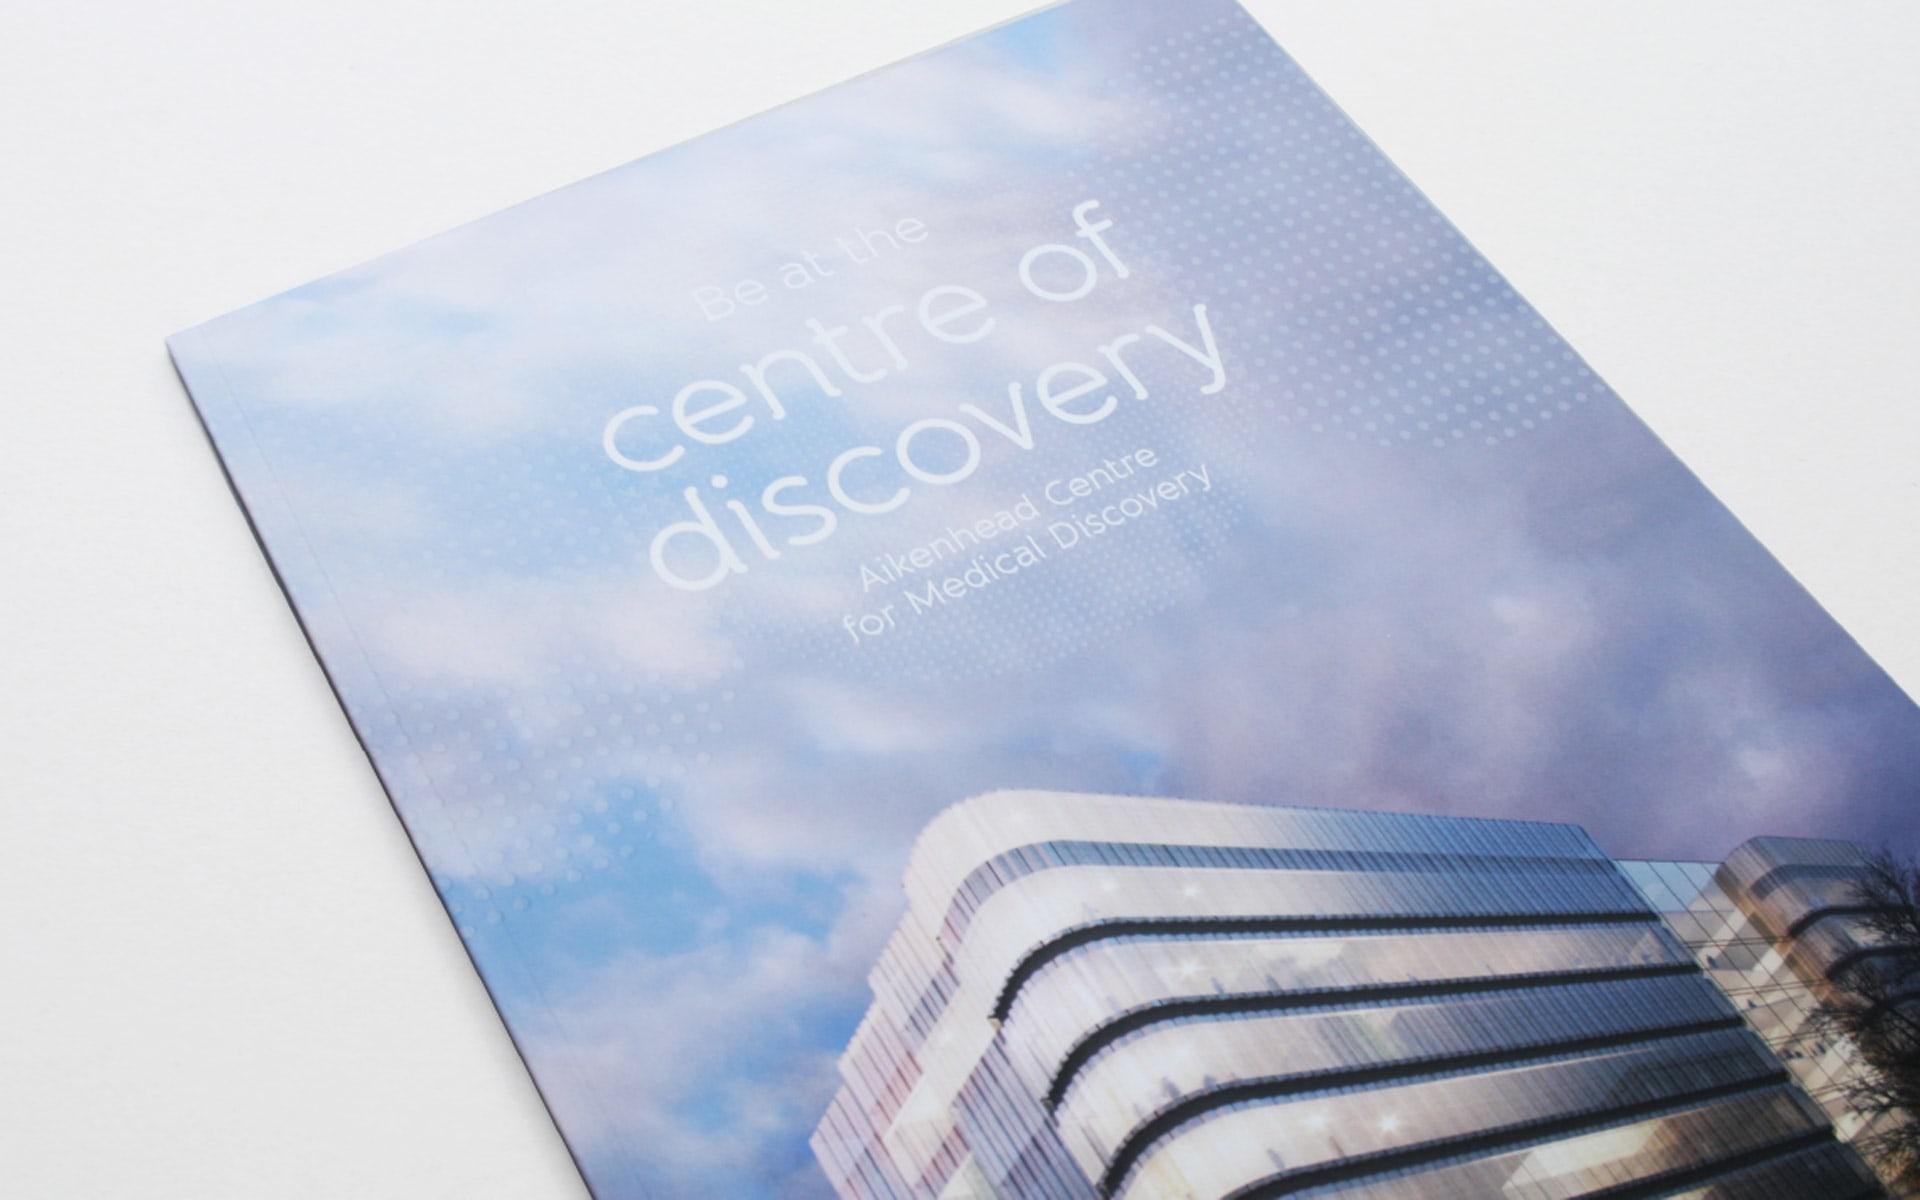 Aikenhead-Centre-For-Medical-Discovery-Brochure-Design